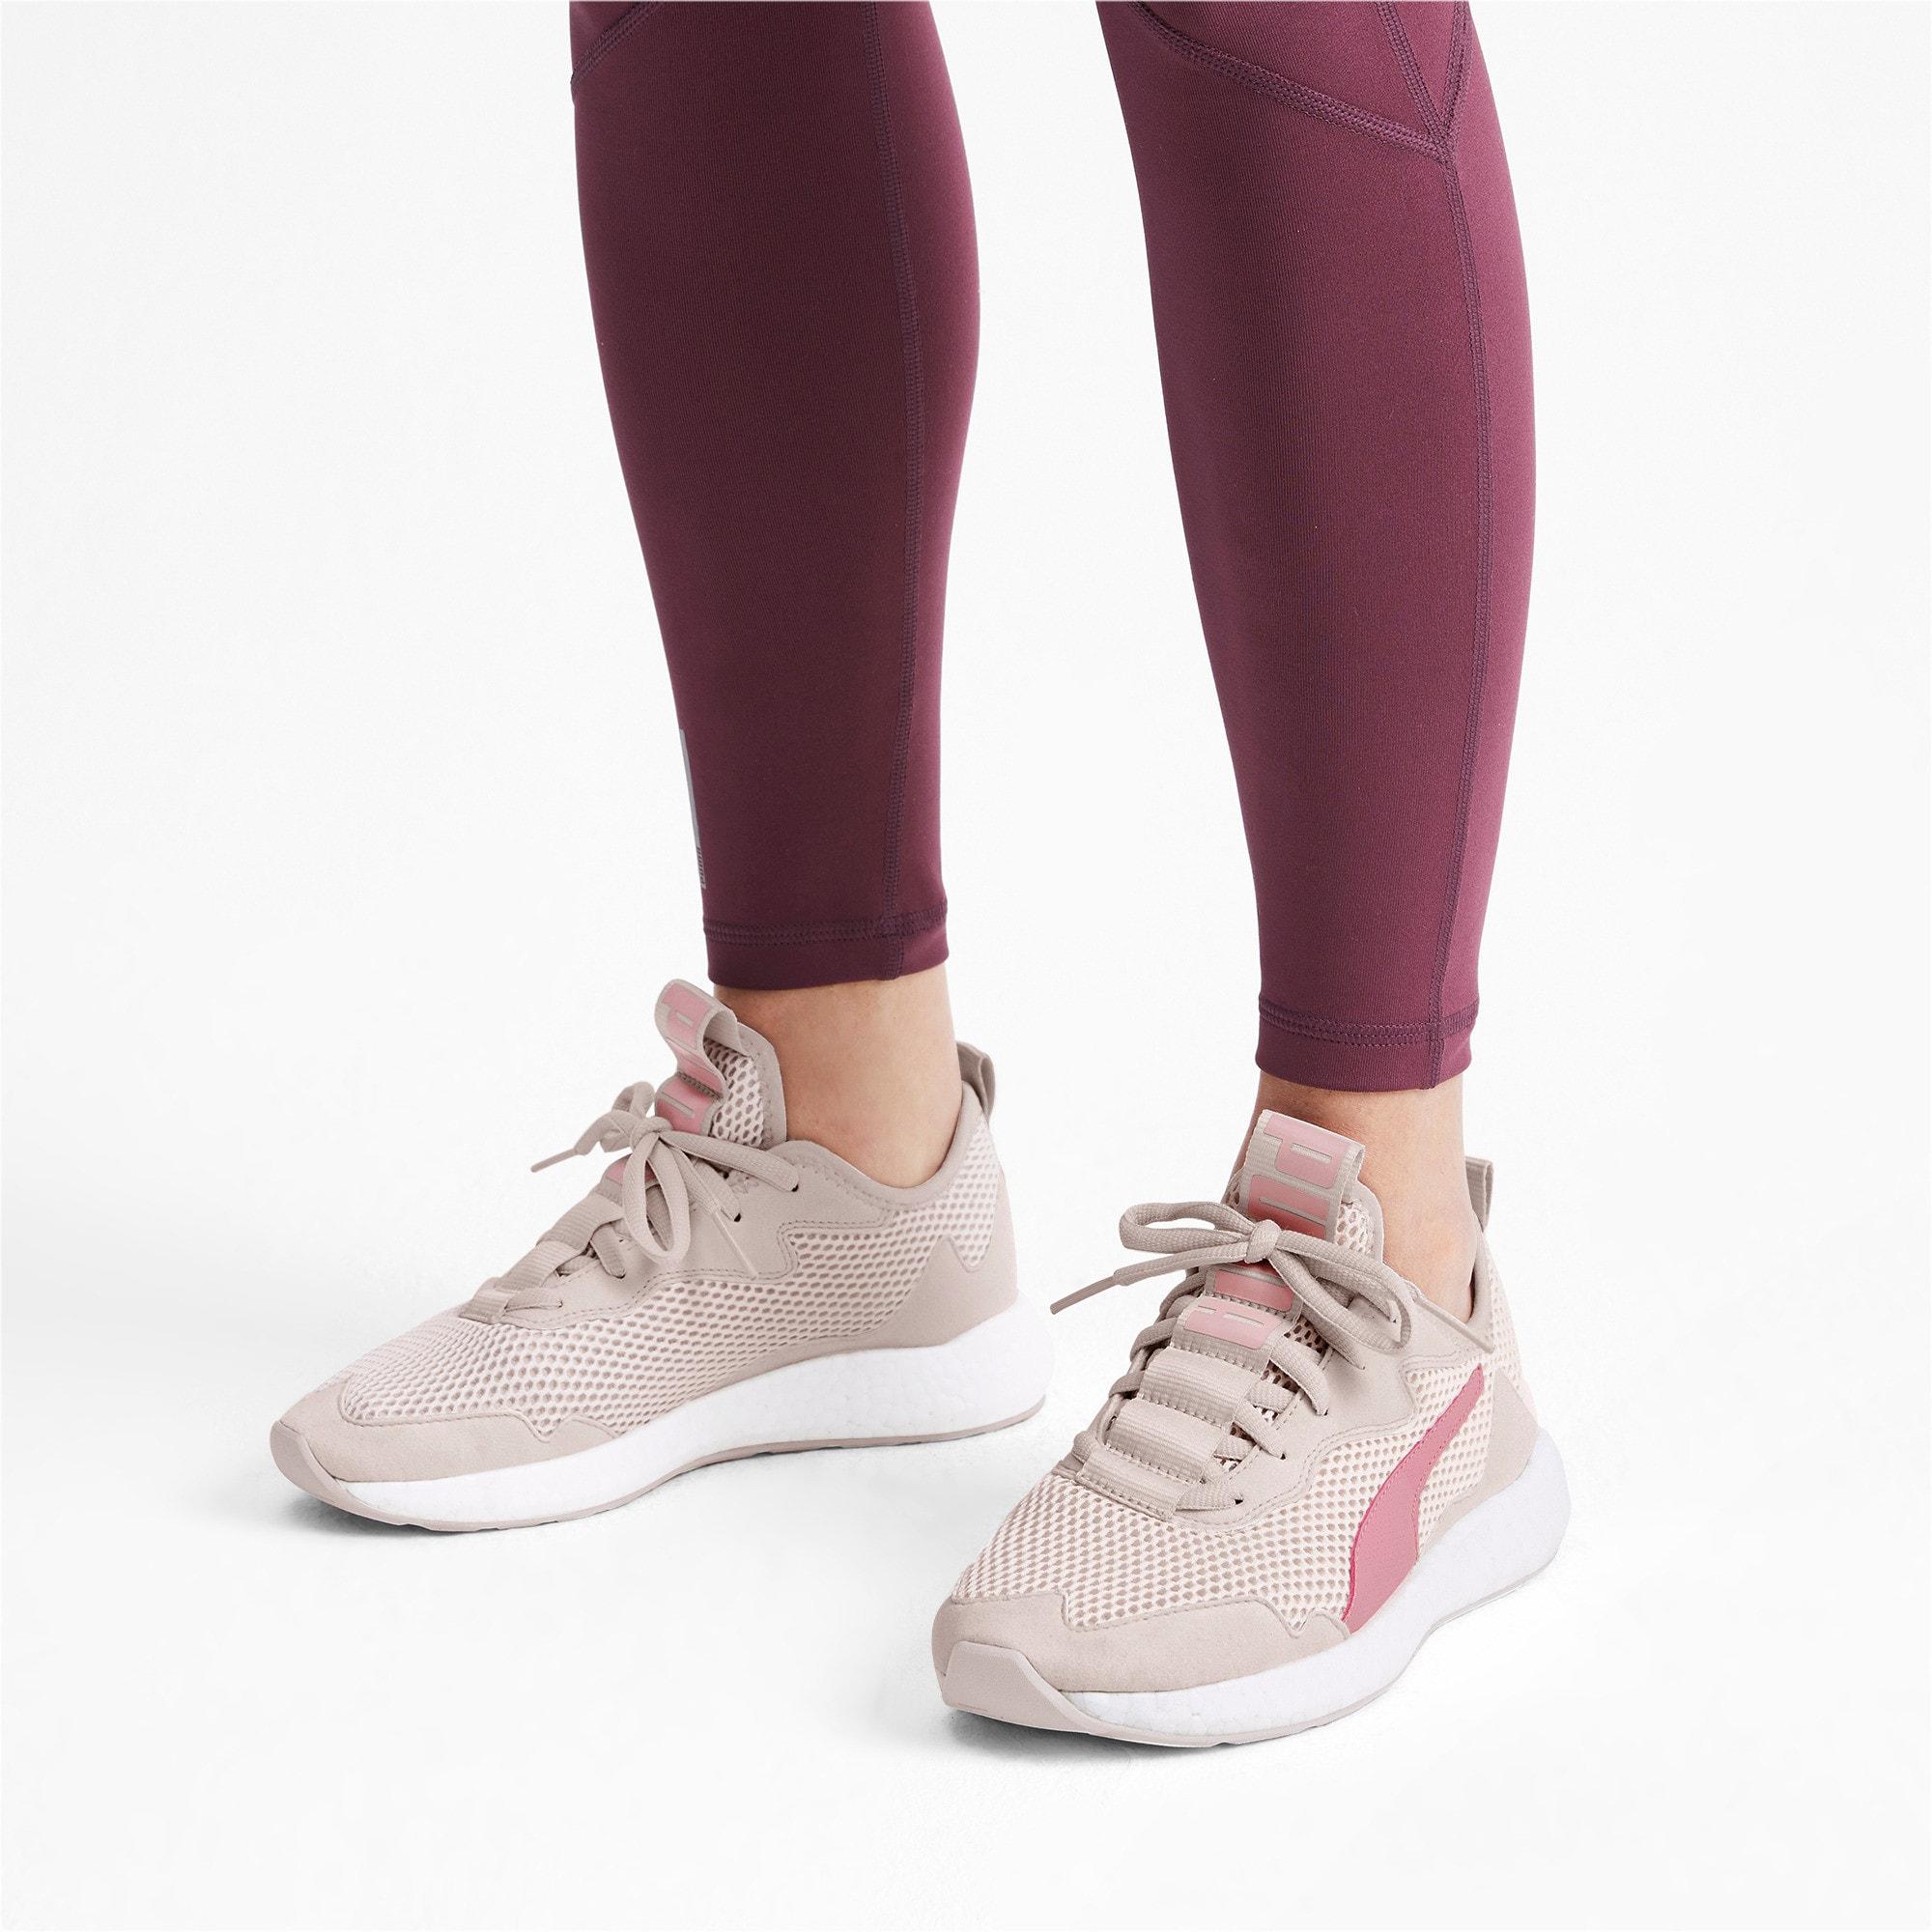 Thumbnail 3 of NRGY Neko Skim Women's Running Shoes, Pastel Parchment-Bridal Rose, medium-IND